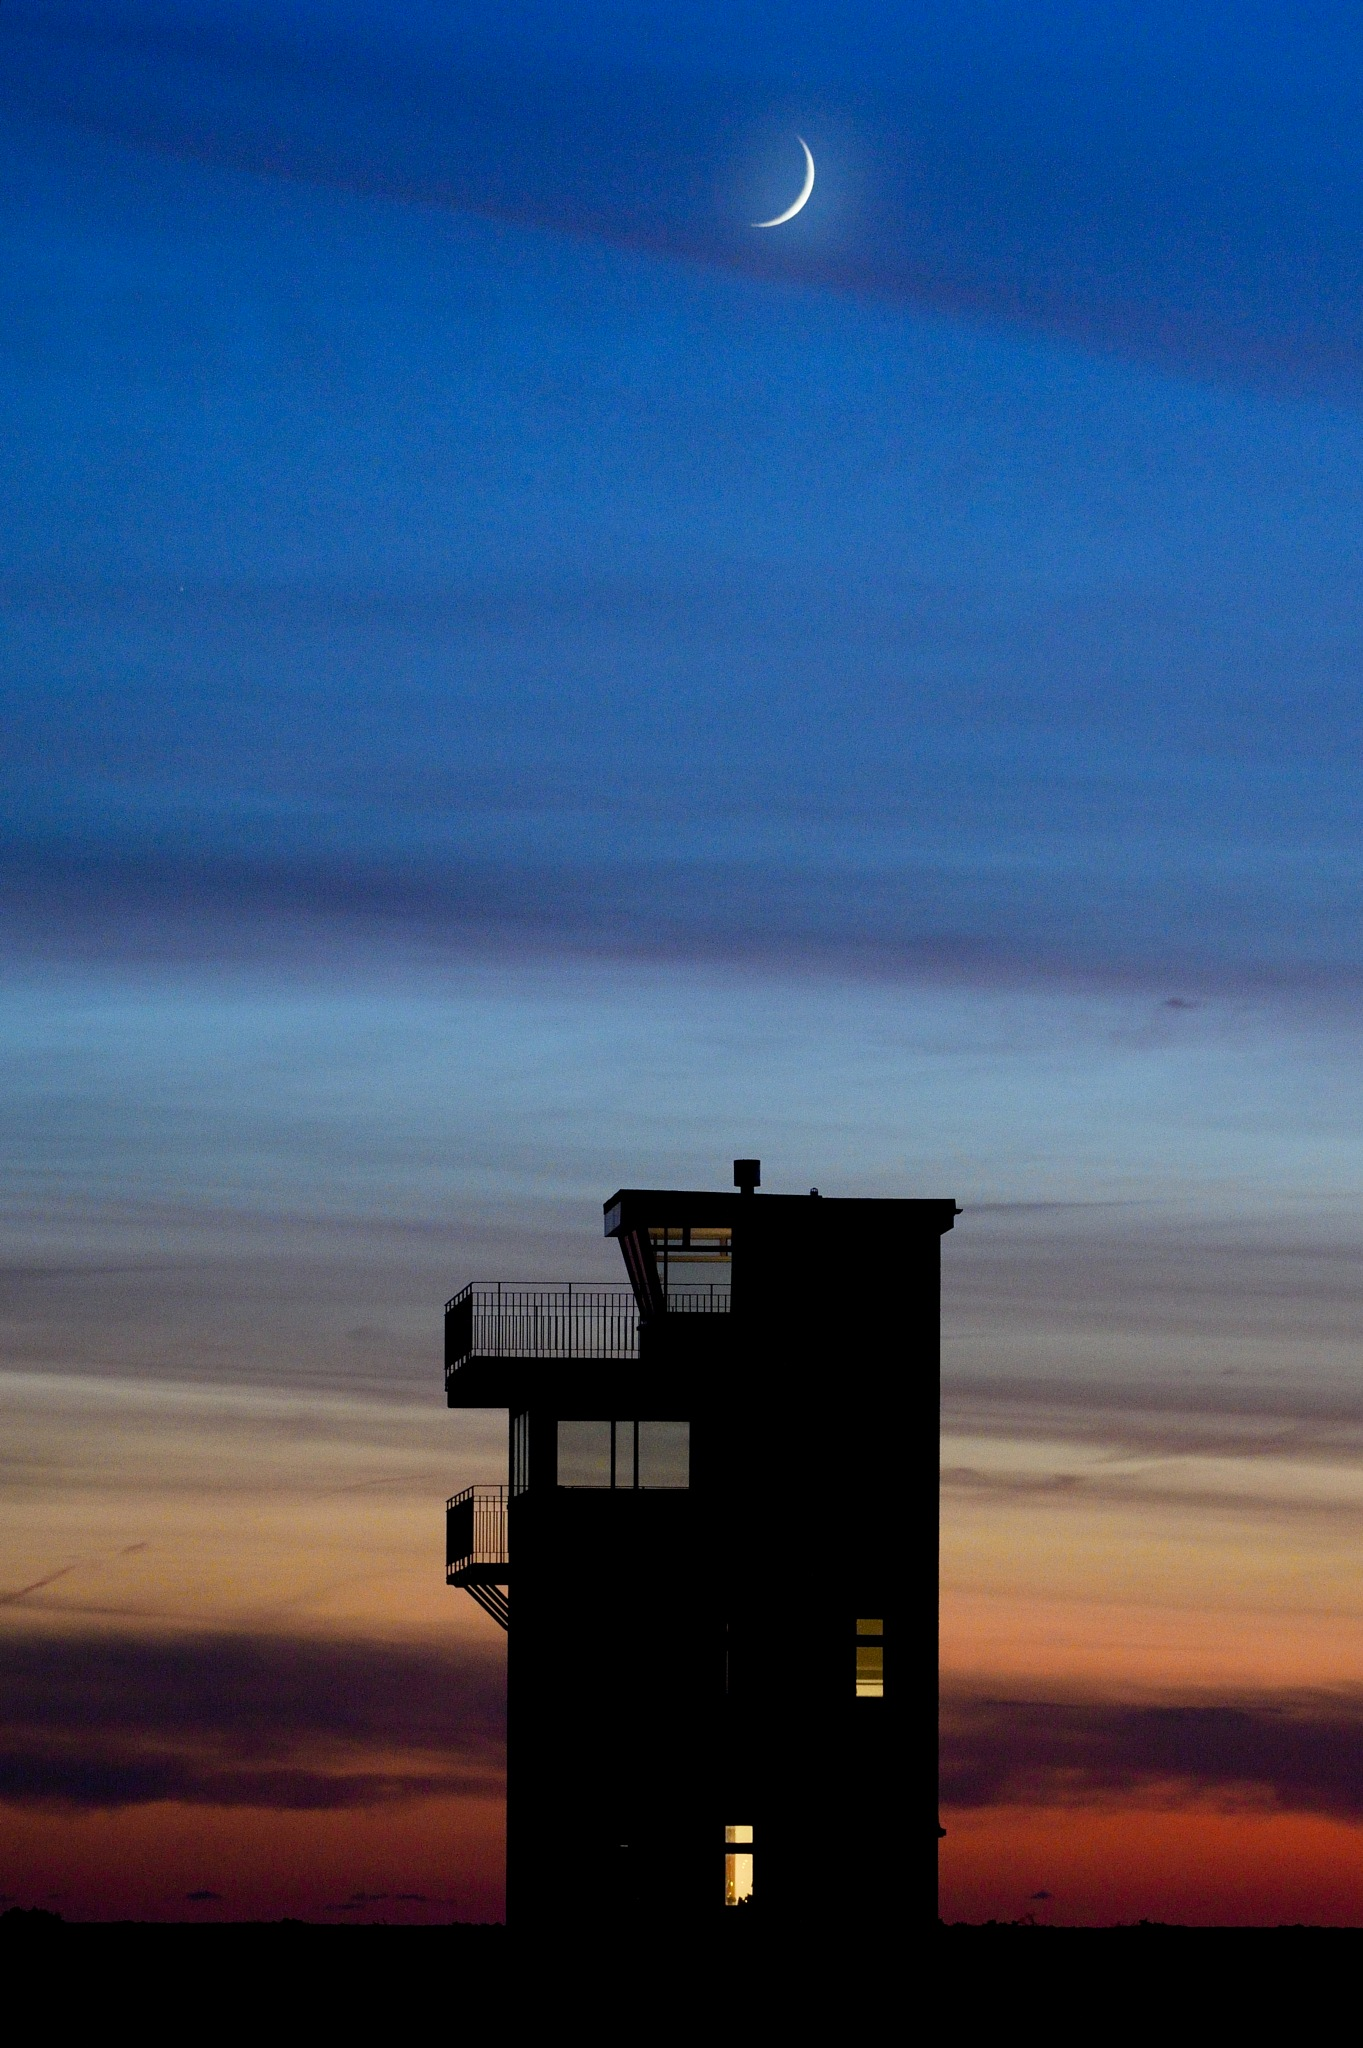 Sunset new moon by MarkBrooks